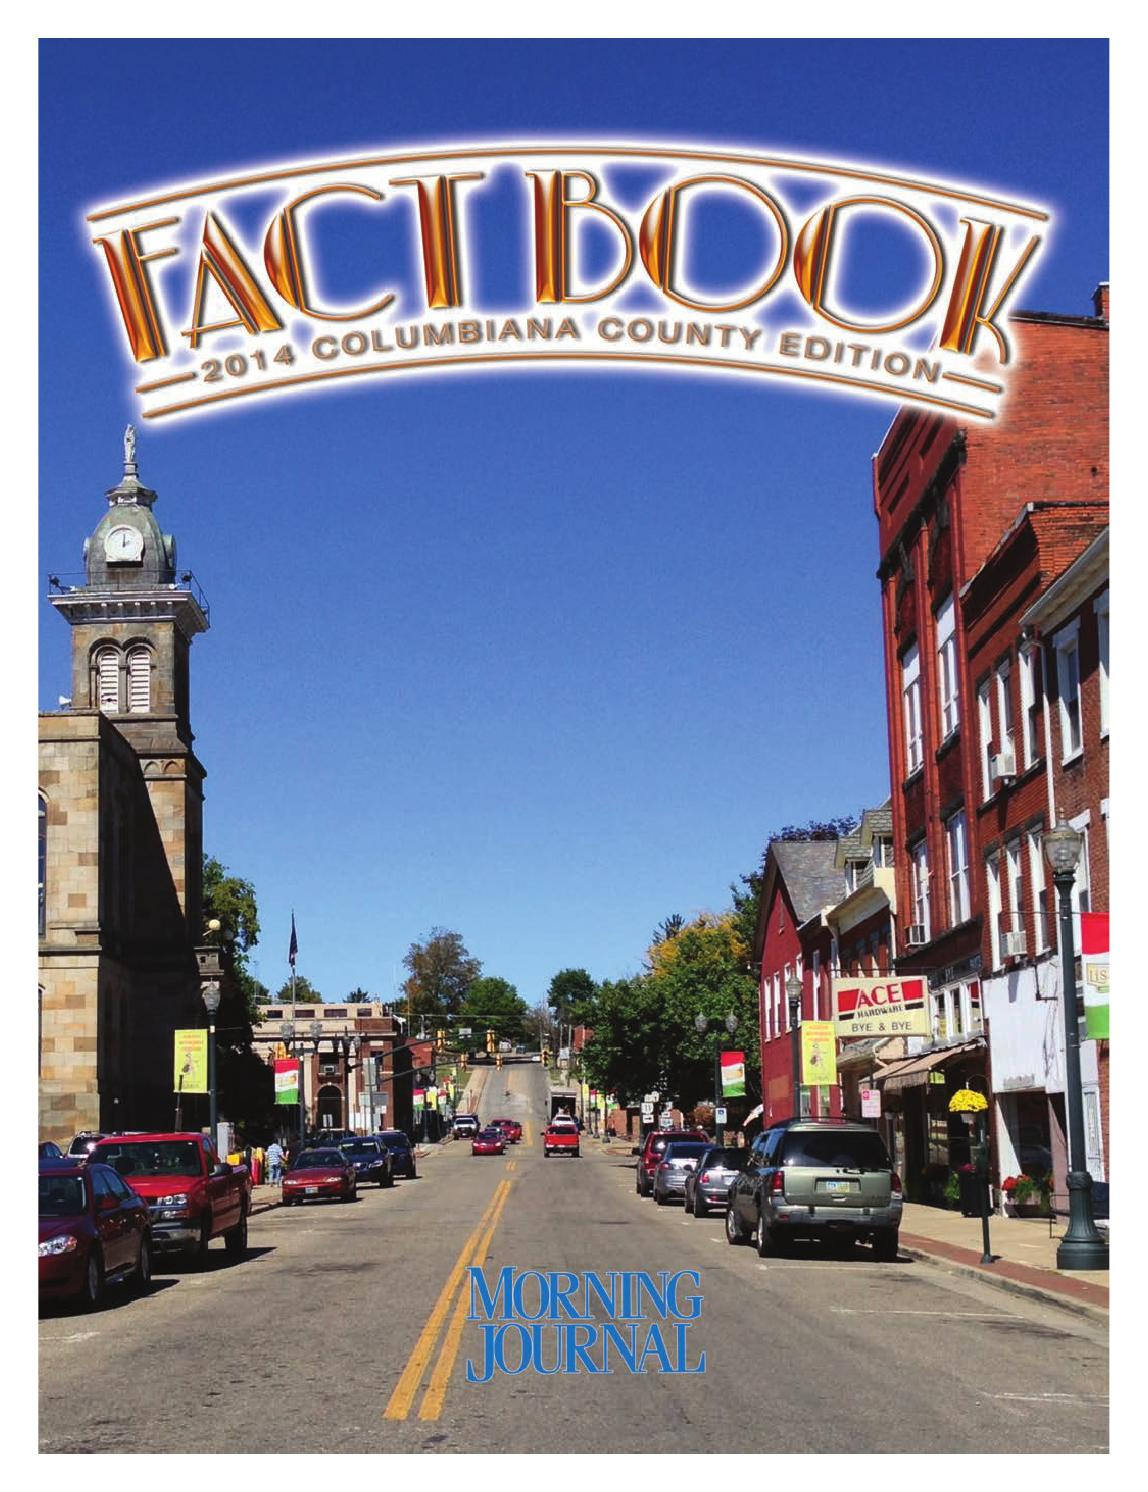 Ohio columbiana county rogers - Morning Journal Columbiana County Fact Book 2014 By Morning Journal Issuu